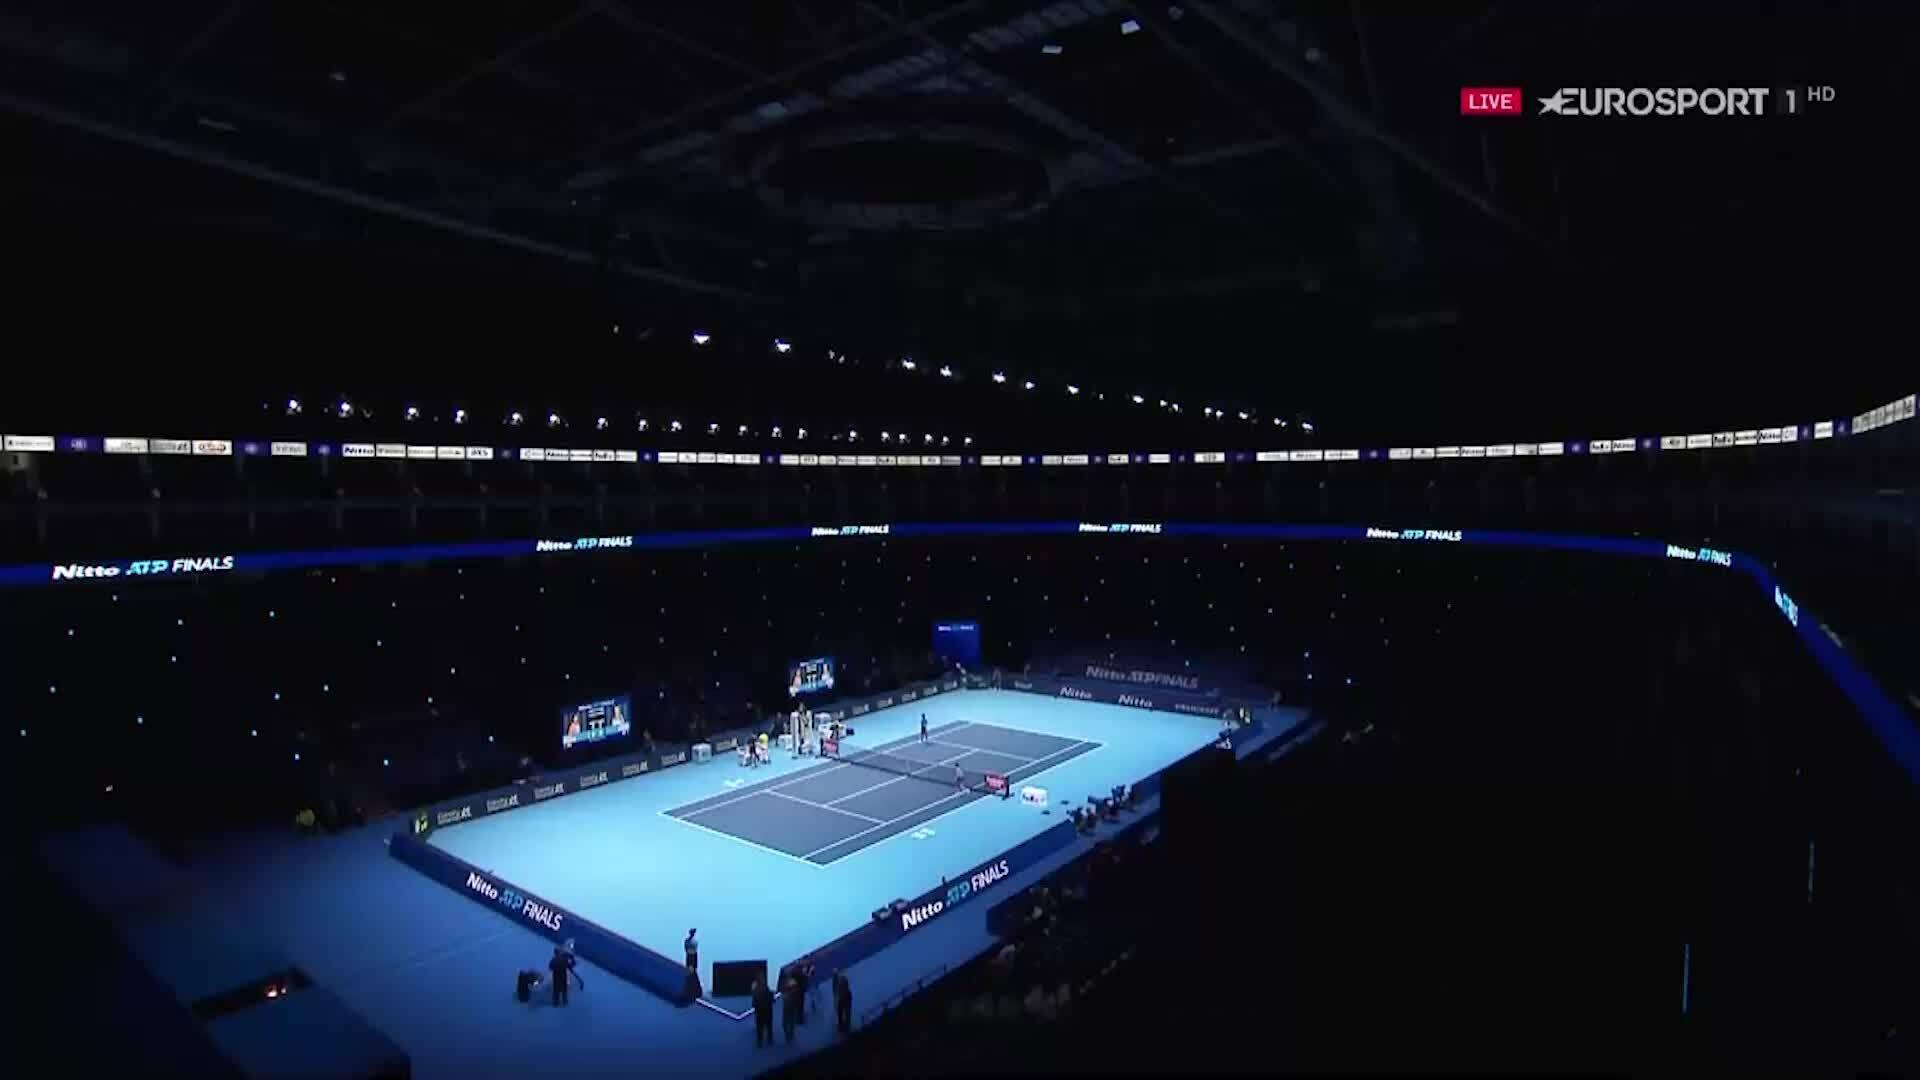 Rafael Nadal 0-2 Dominic Thiem